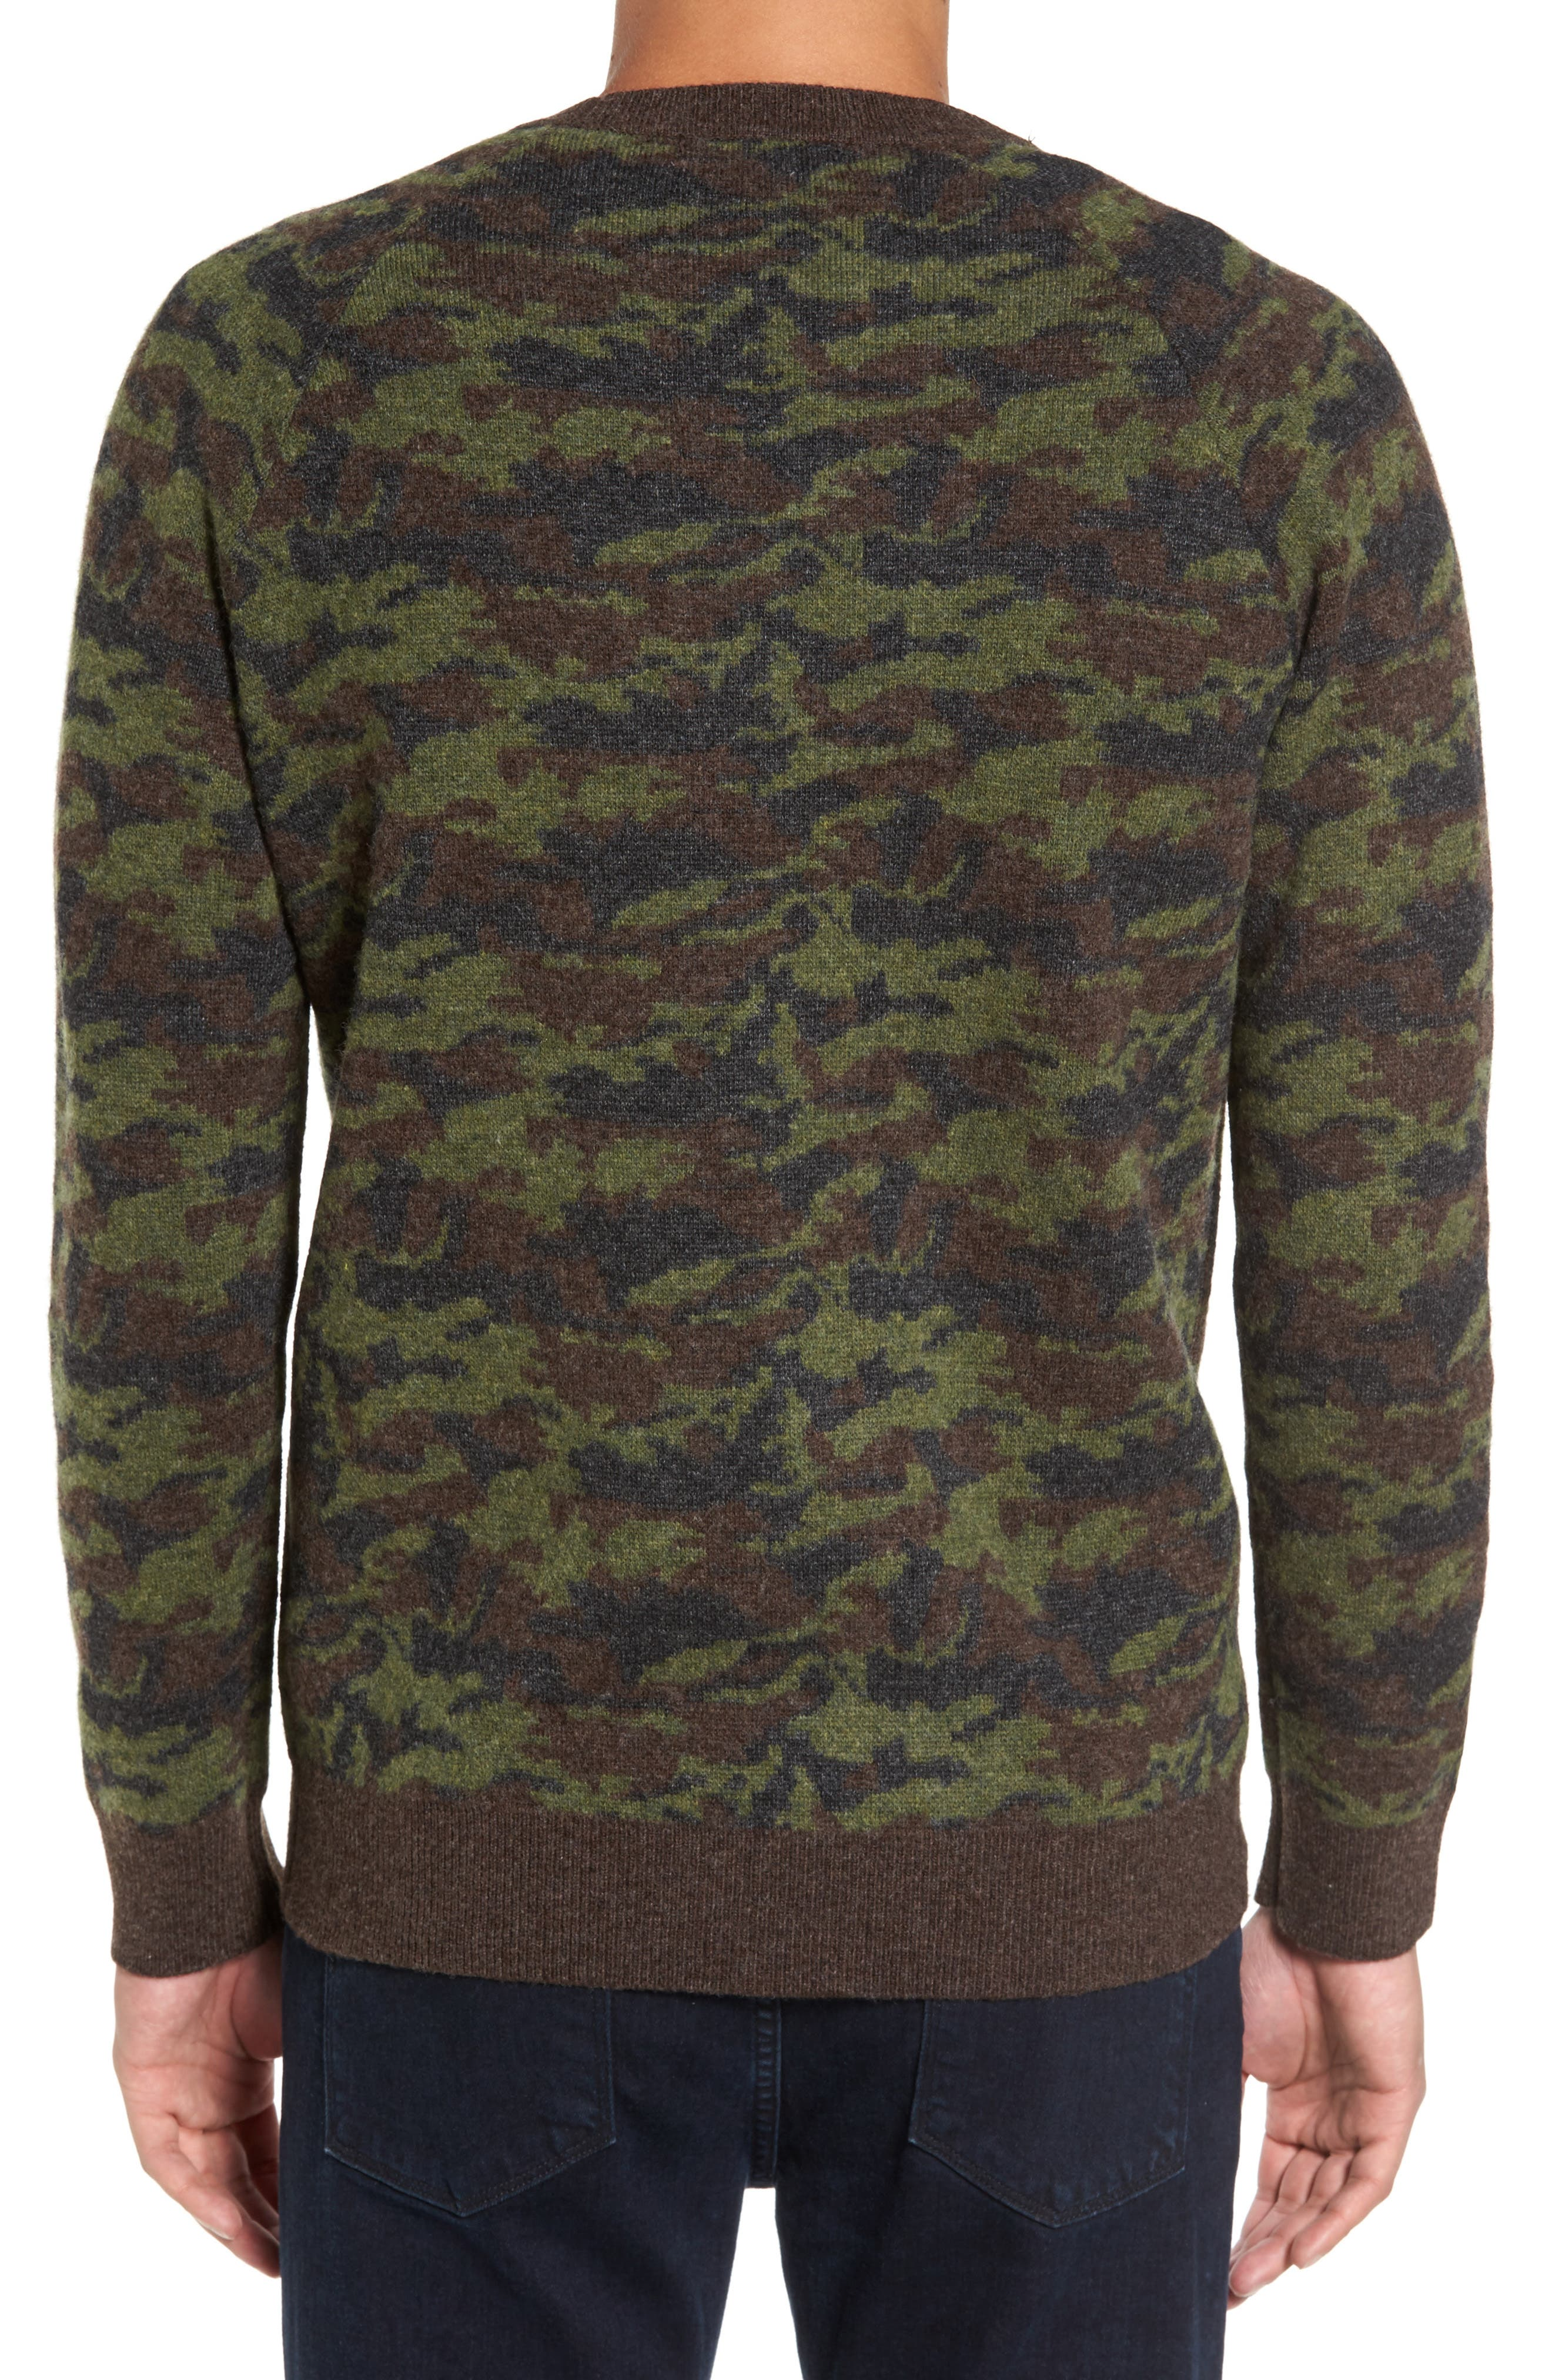 Wool Camo Sweater,                             Alternate thumbnail 2, color,                             Green Camo